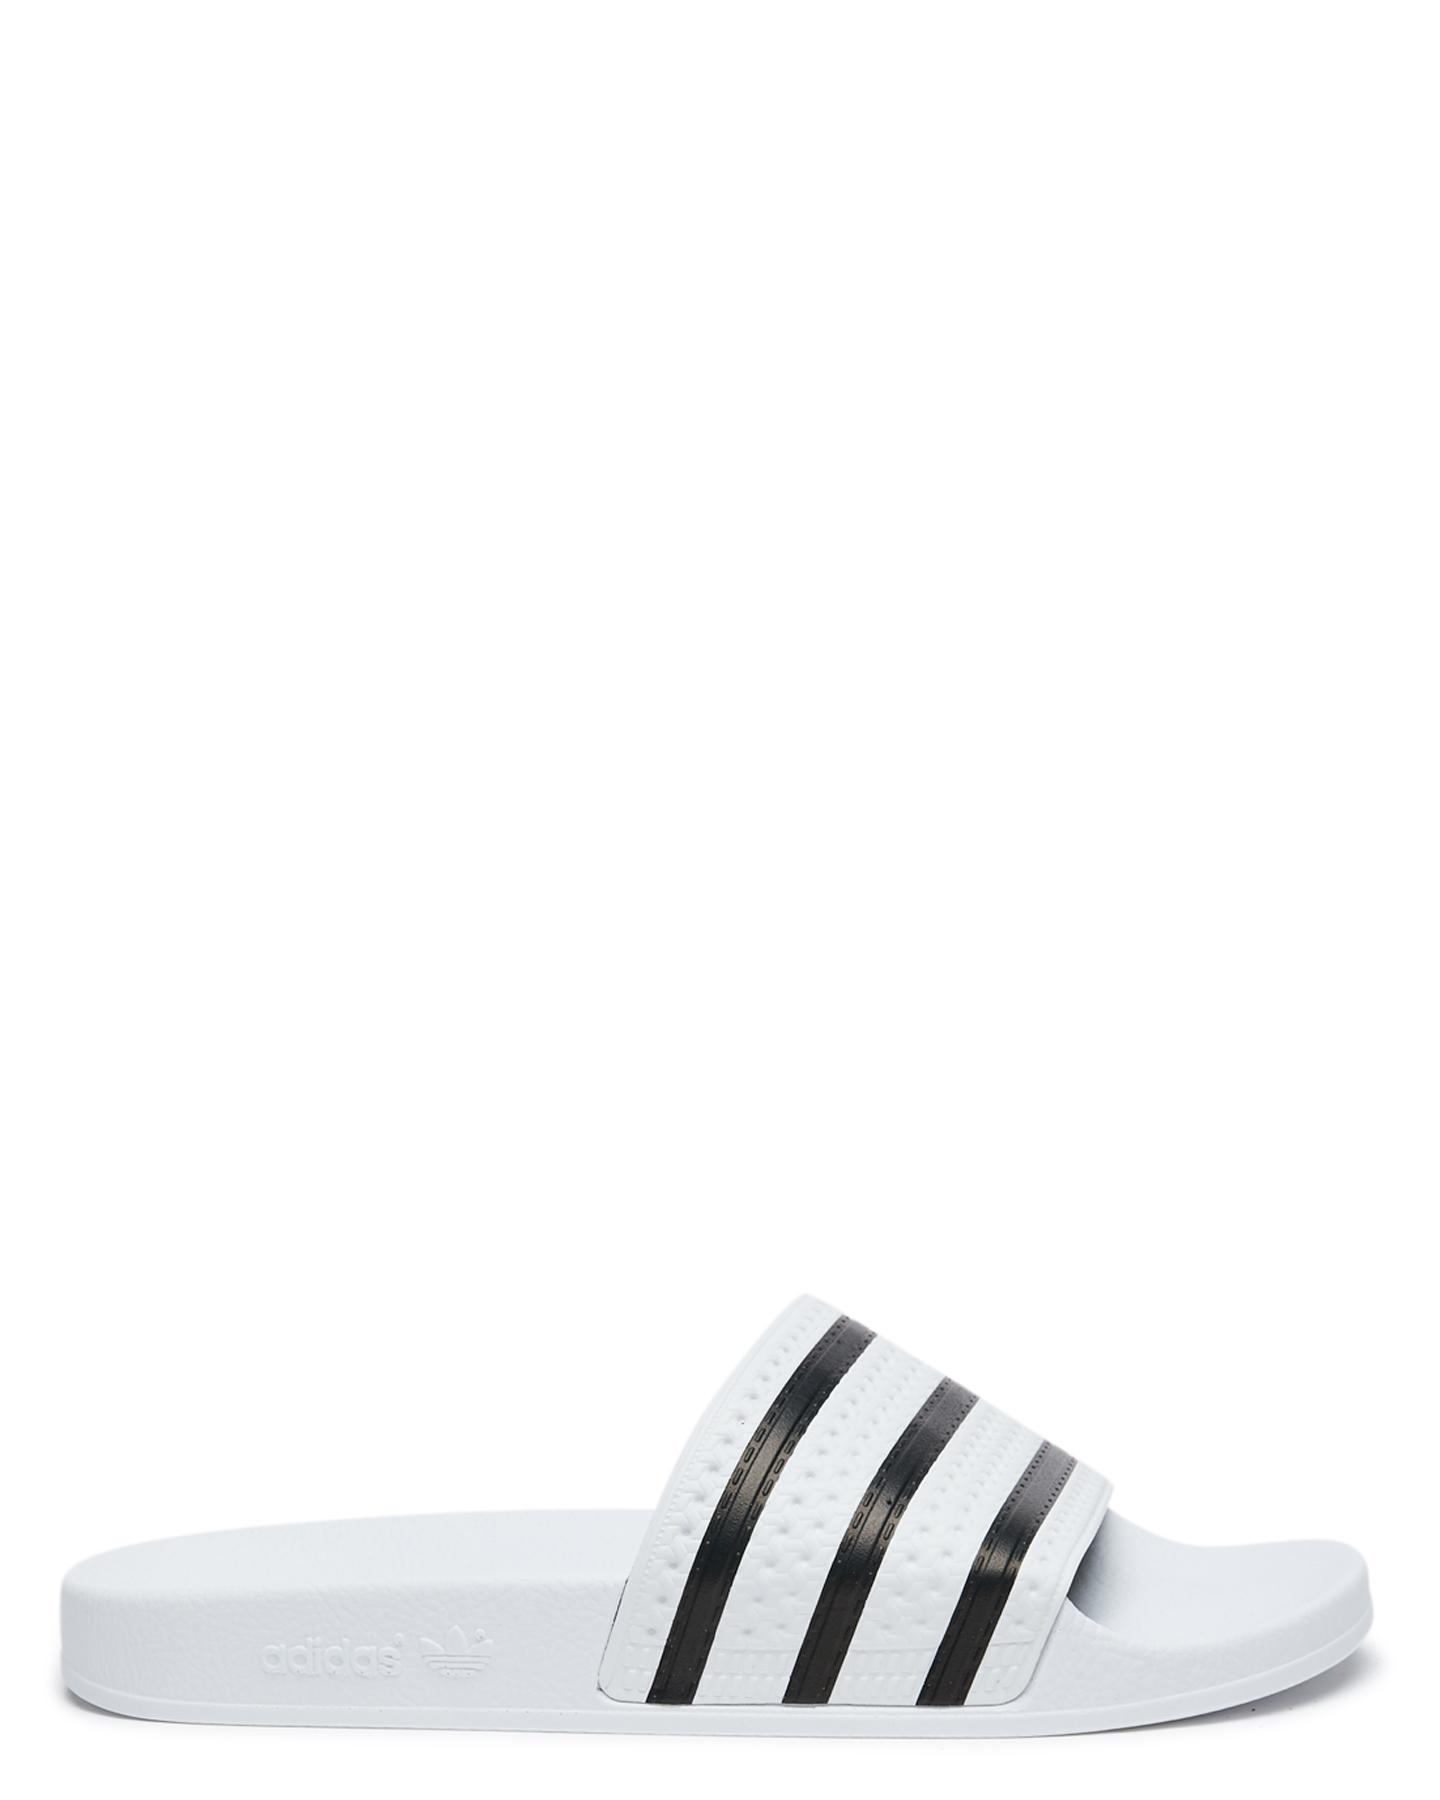 f93daff4717f Adidas Womens Adilette Thong - White